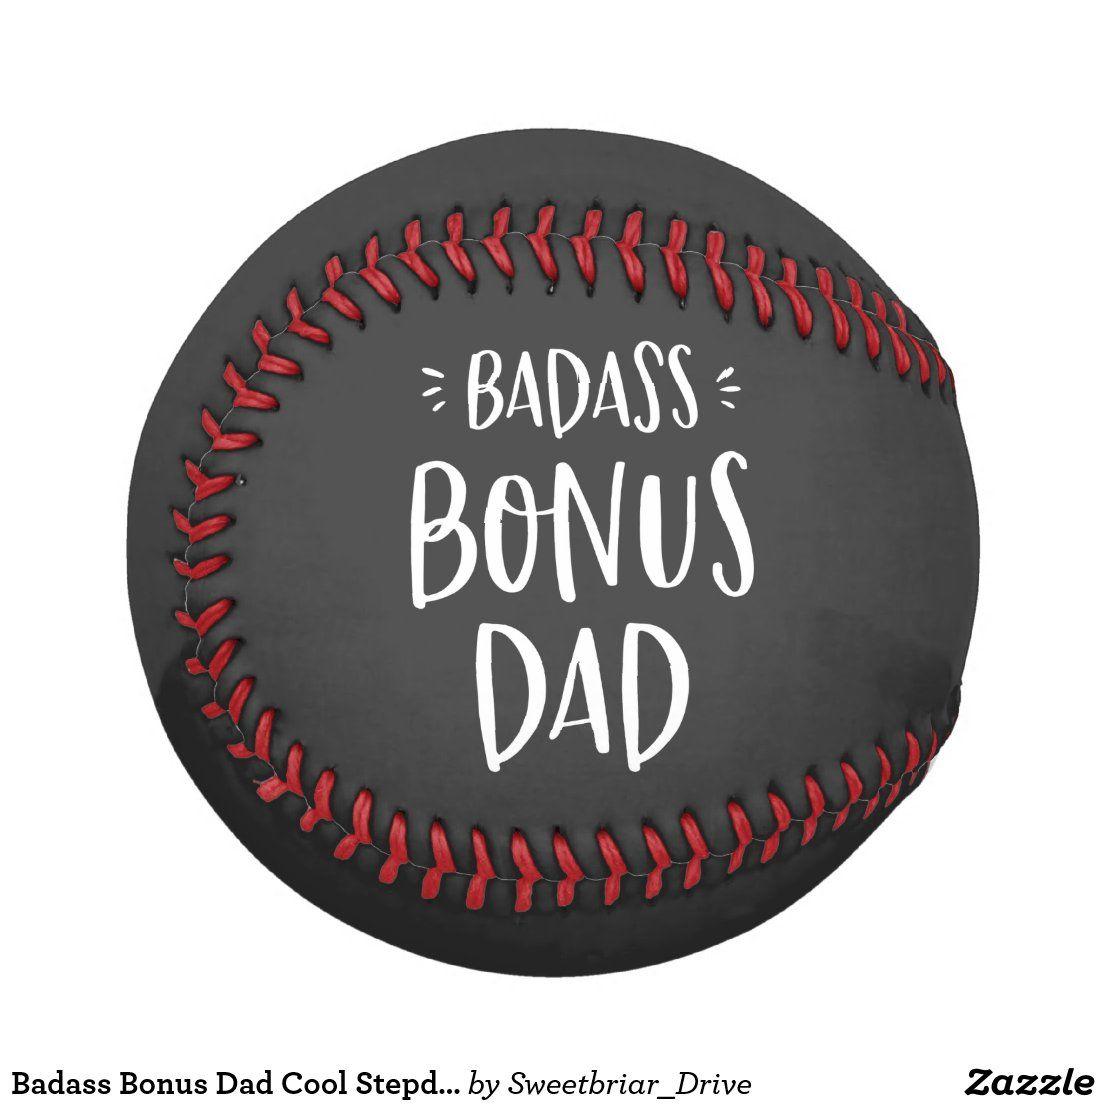 Badass bonus dad cool stepdad gift for stepfather baseball